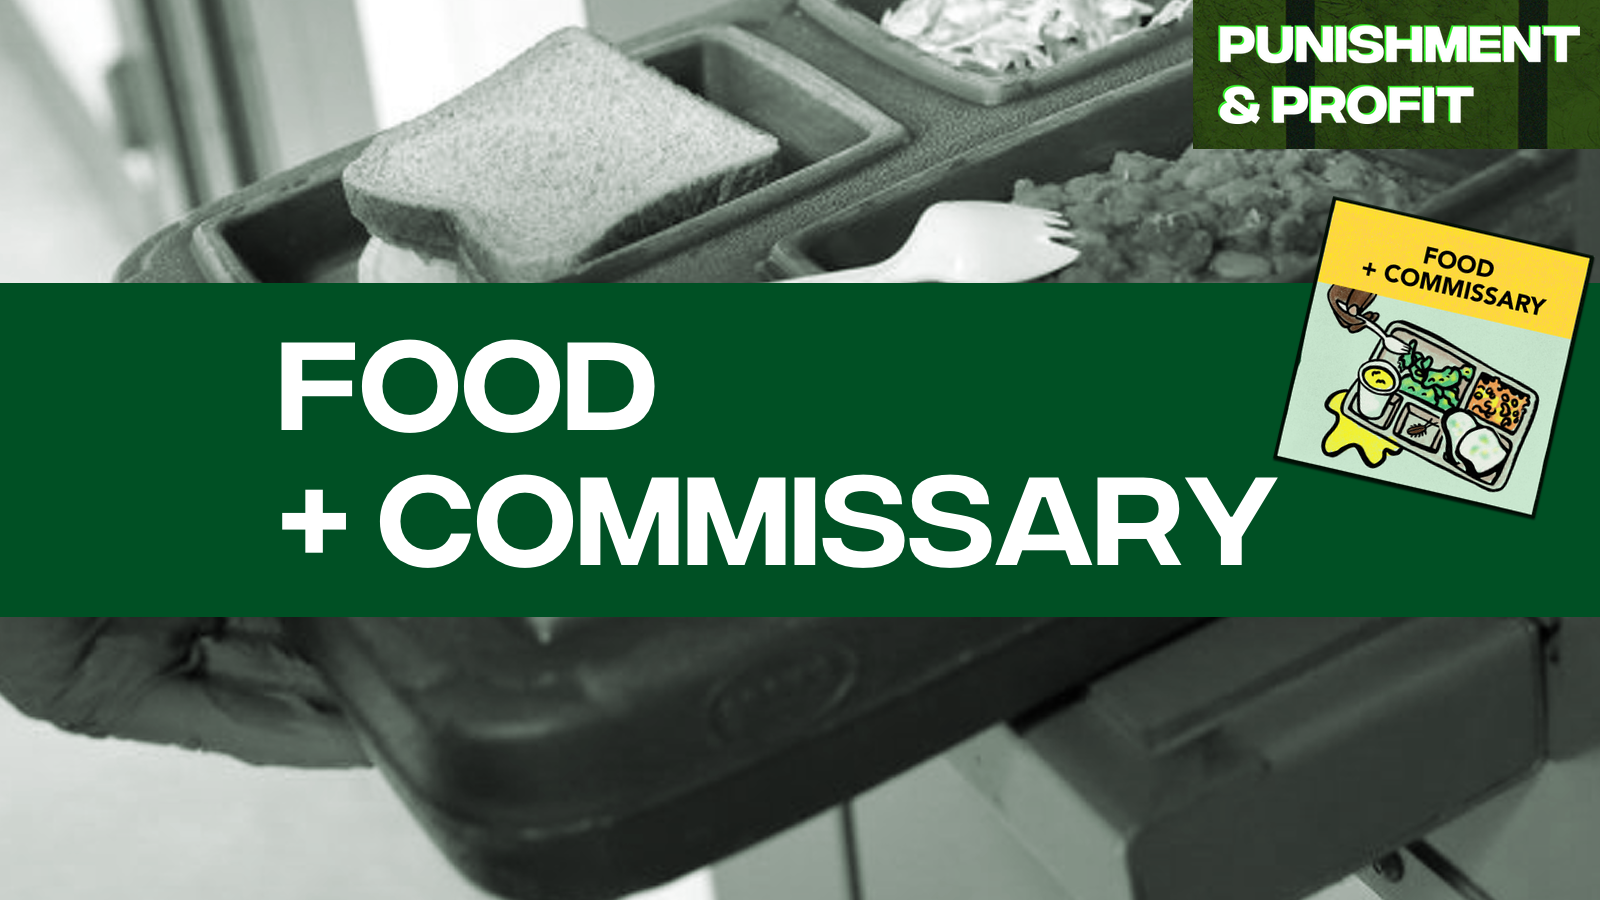 Punishment & Profit: Food & Commissary